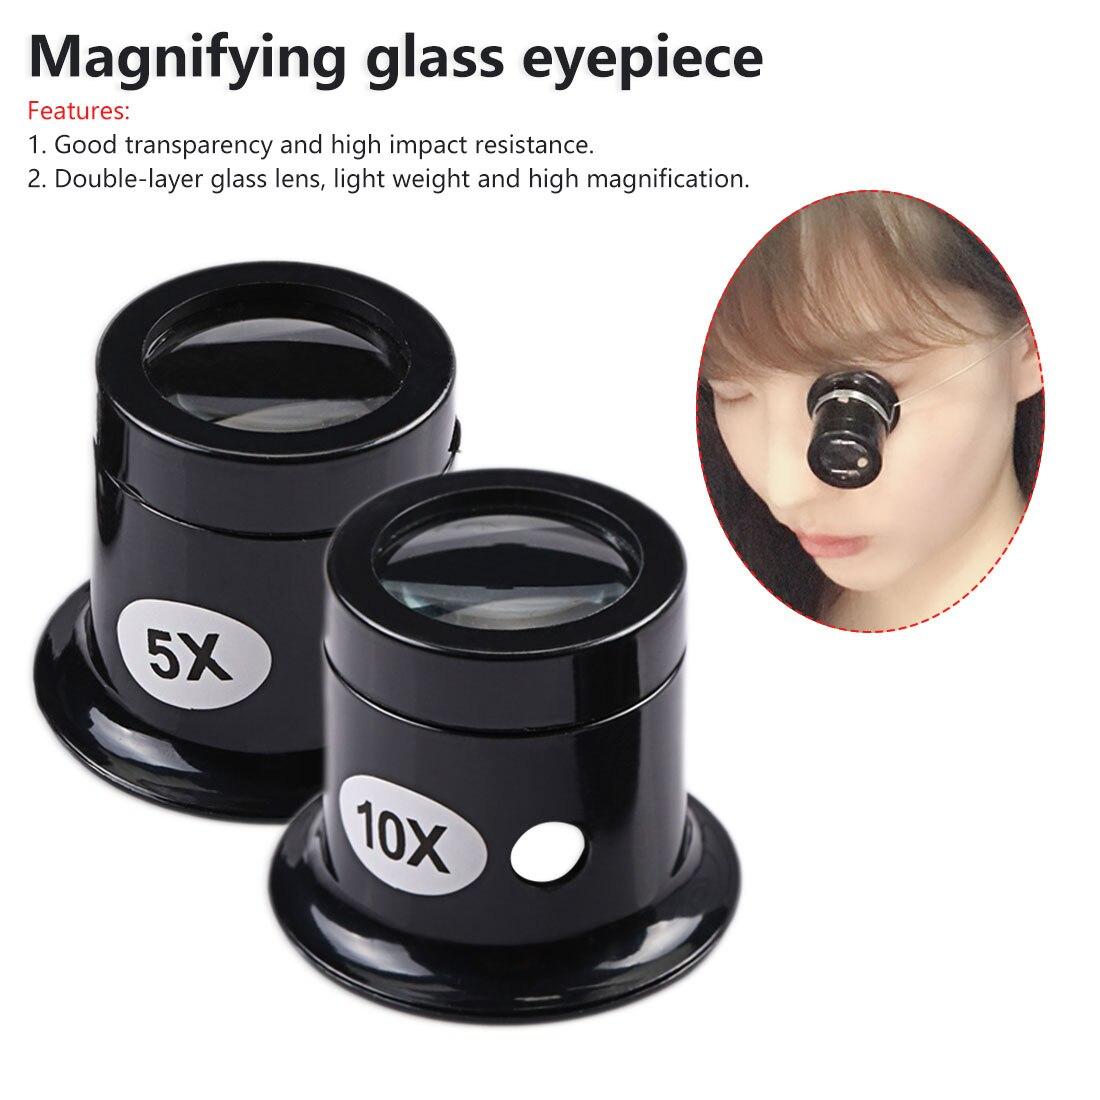 Monocular Magnifying Glass 5X/10X Portable Loupe Lens Jeweler Watch Magnifier Tool Eye Magnifier Lens Repair Tool Kit